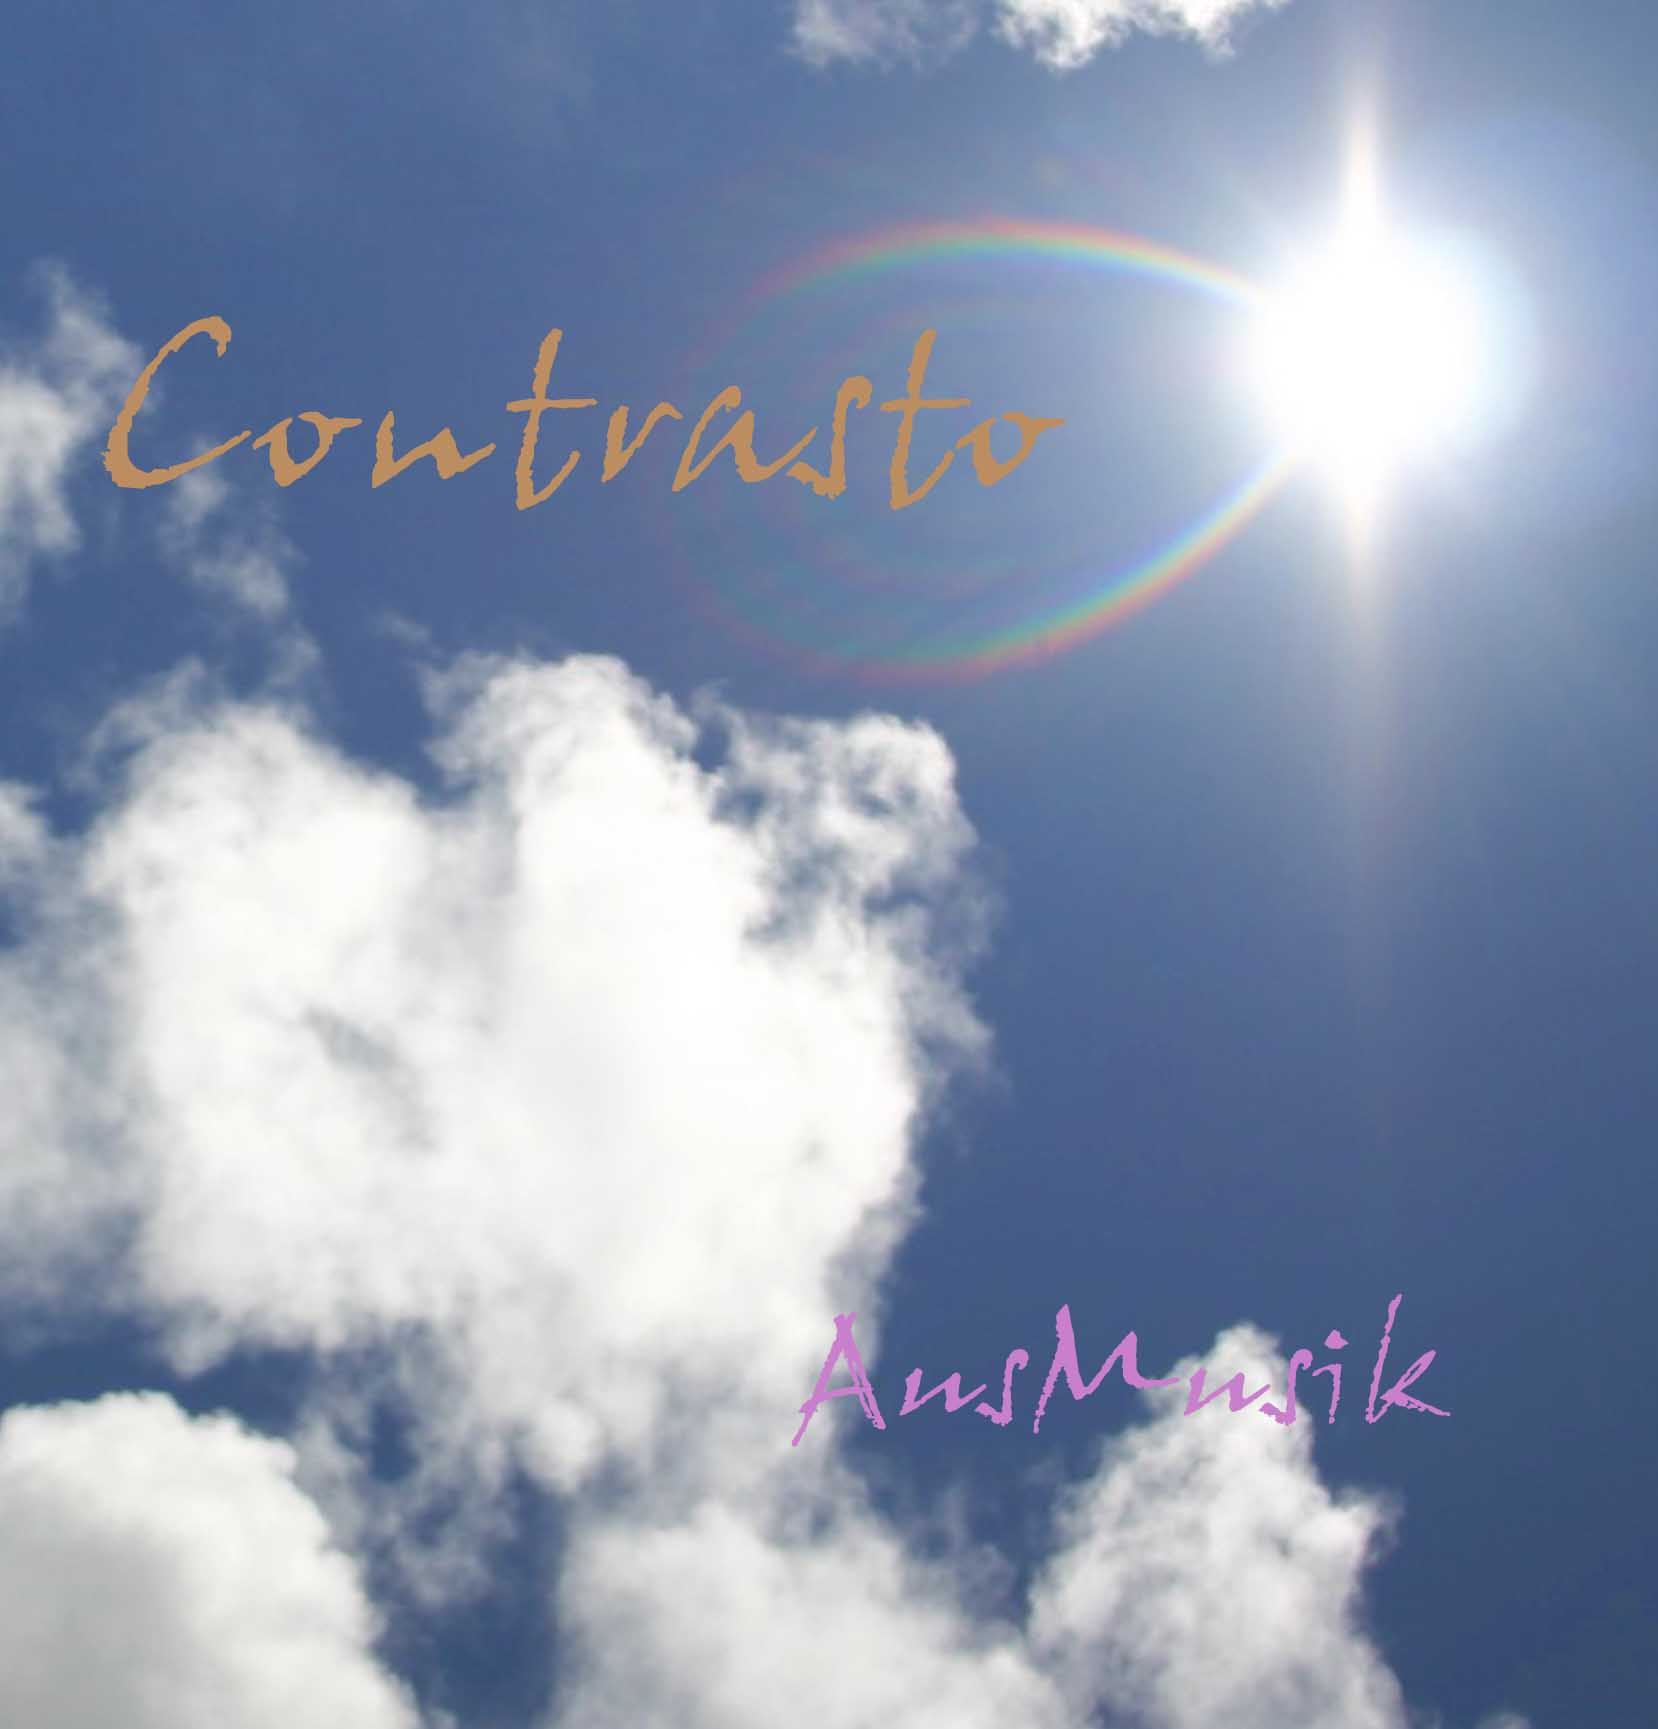 cd_contrasto.jpg